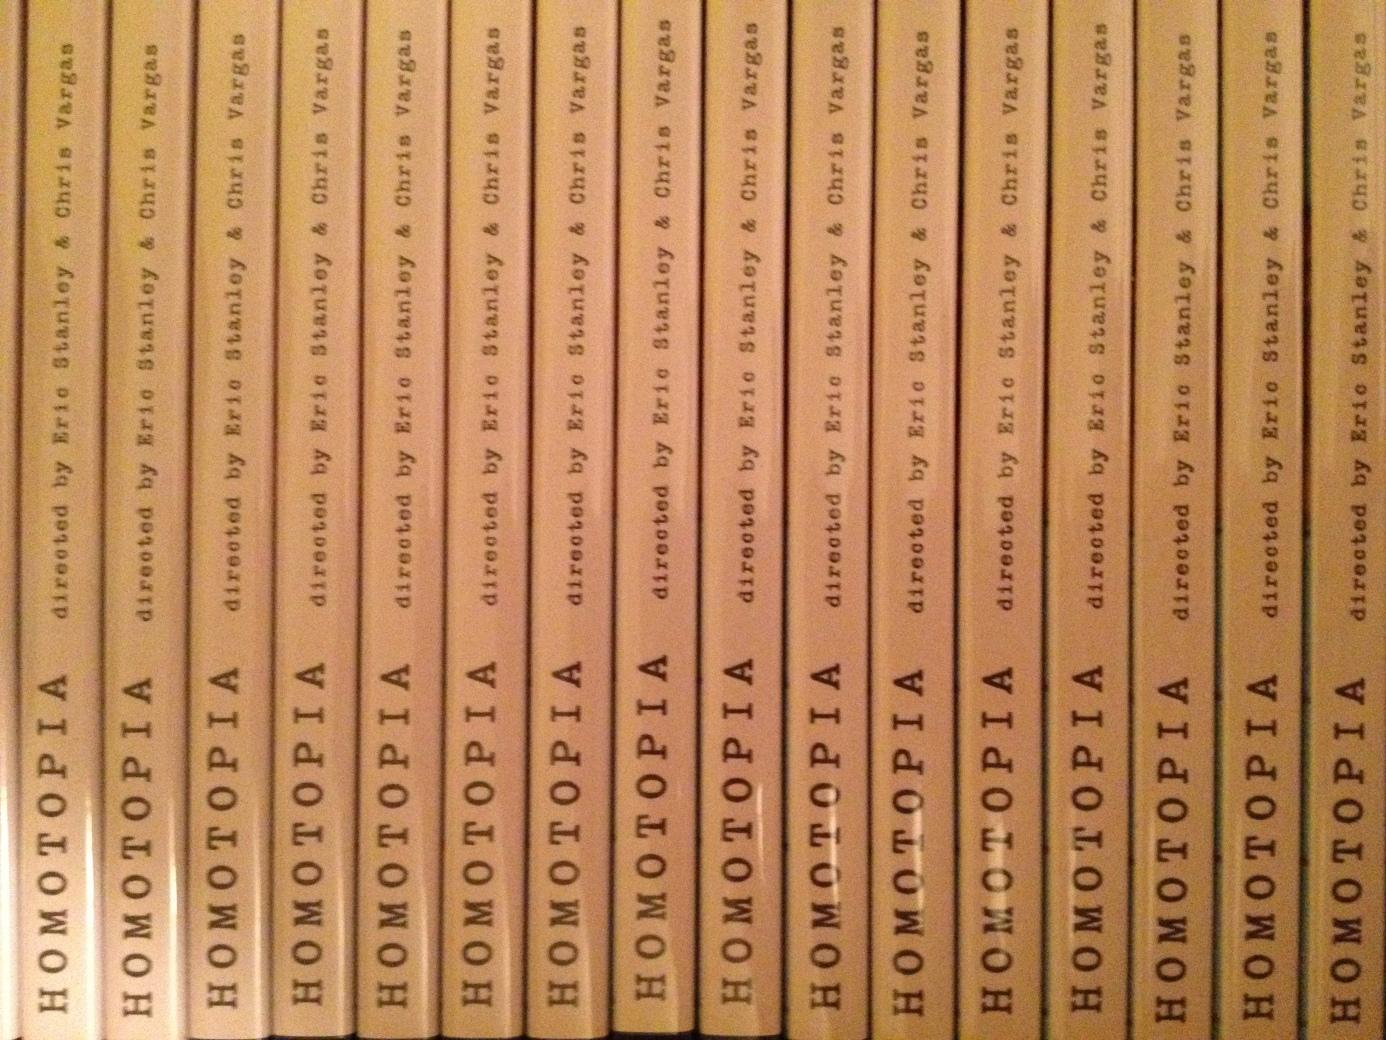 homotopia dvd spine